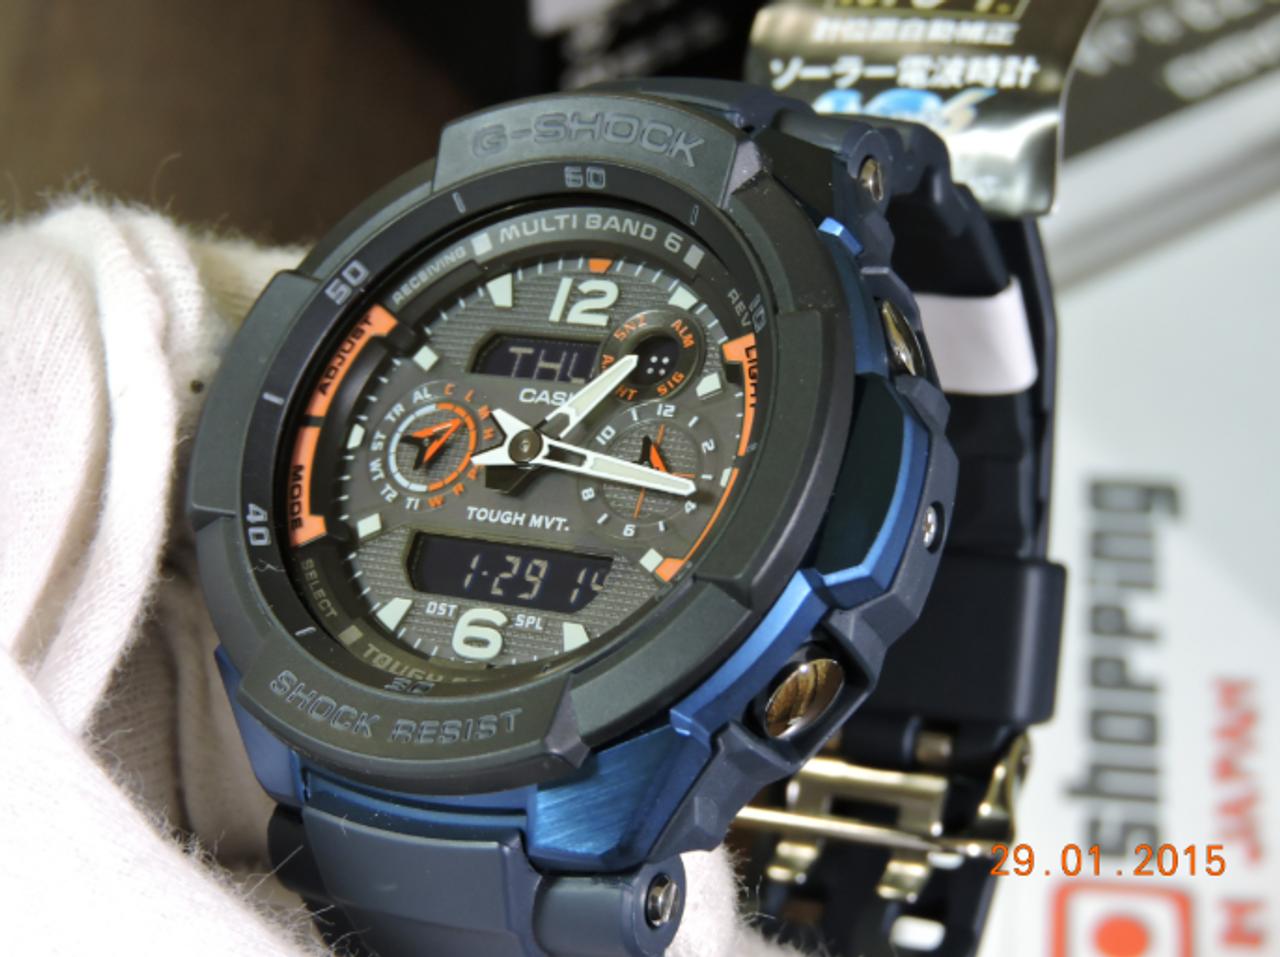 G-Shock GW-3500B-2AJF